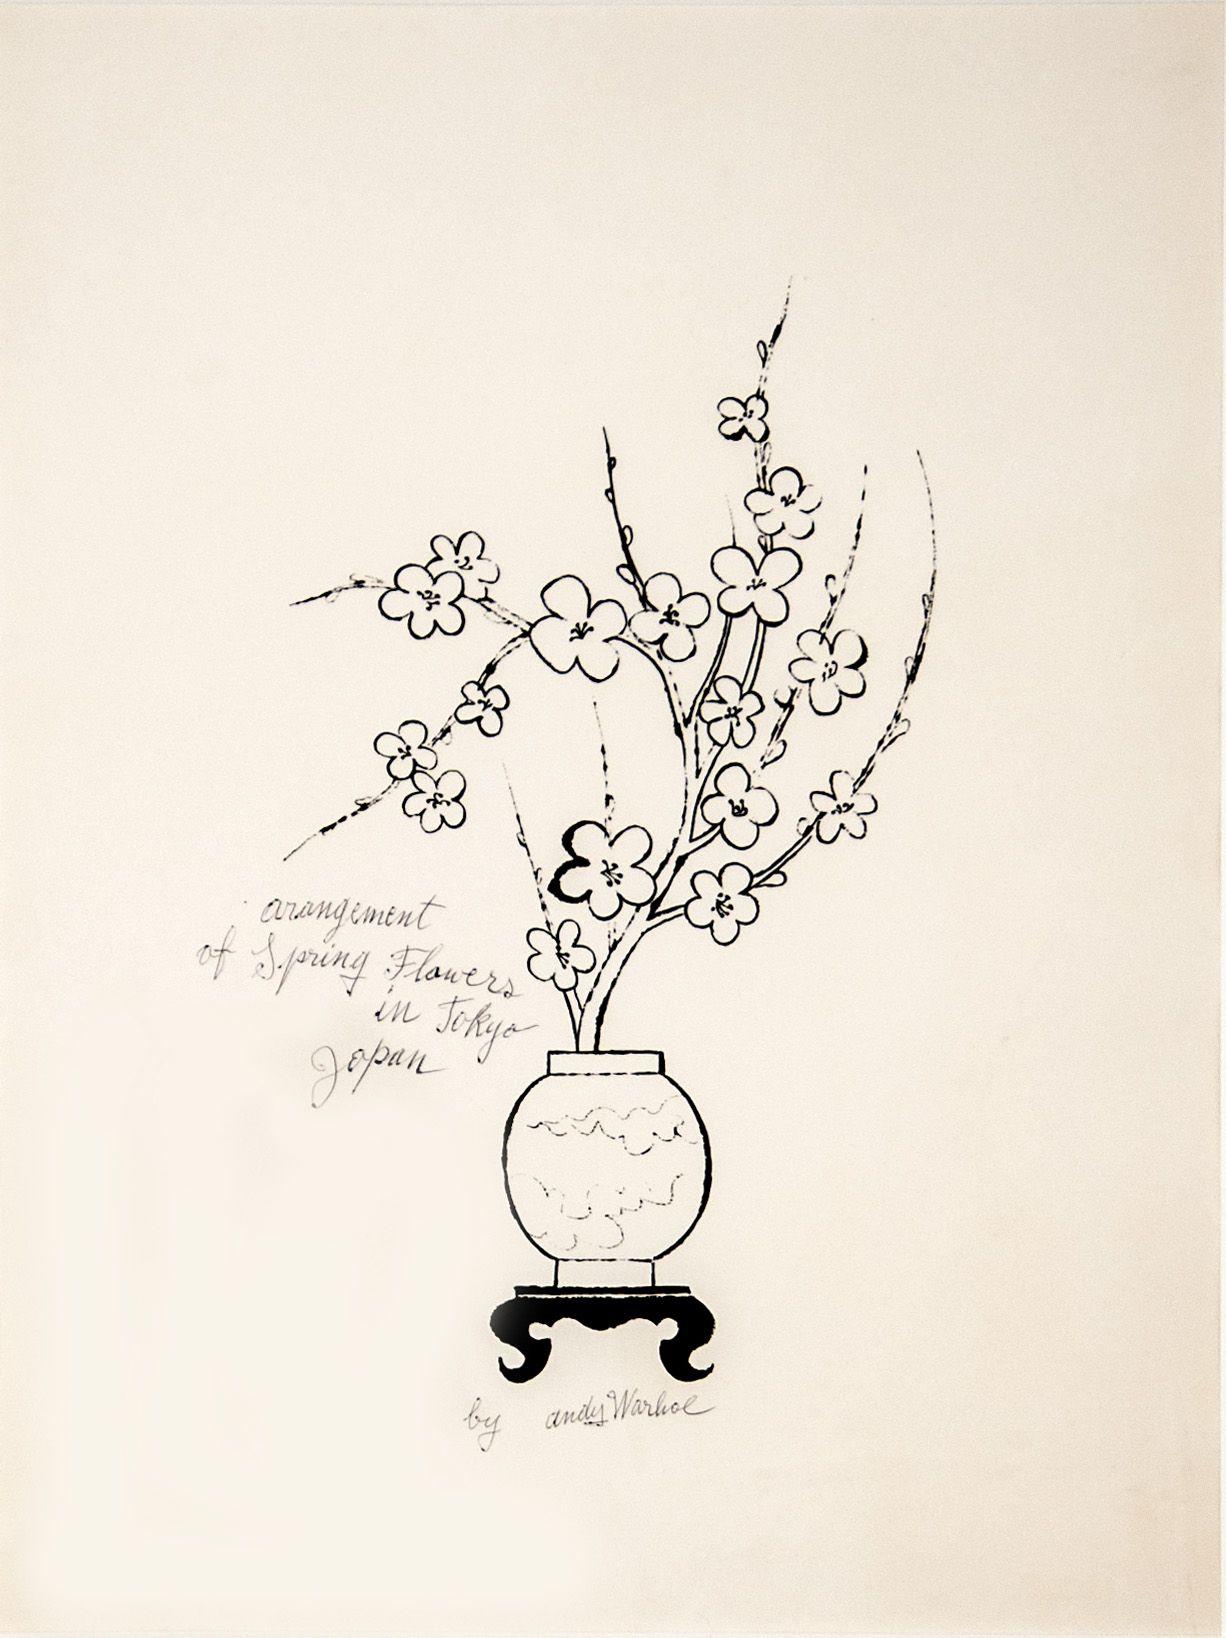 "Andy Warhol_Arrangement of Spring Flowers in Tokyo, Japan, 1956 (19"" x 14"") - Casterline|Goodman"